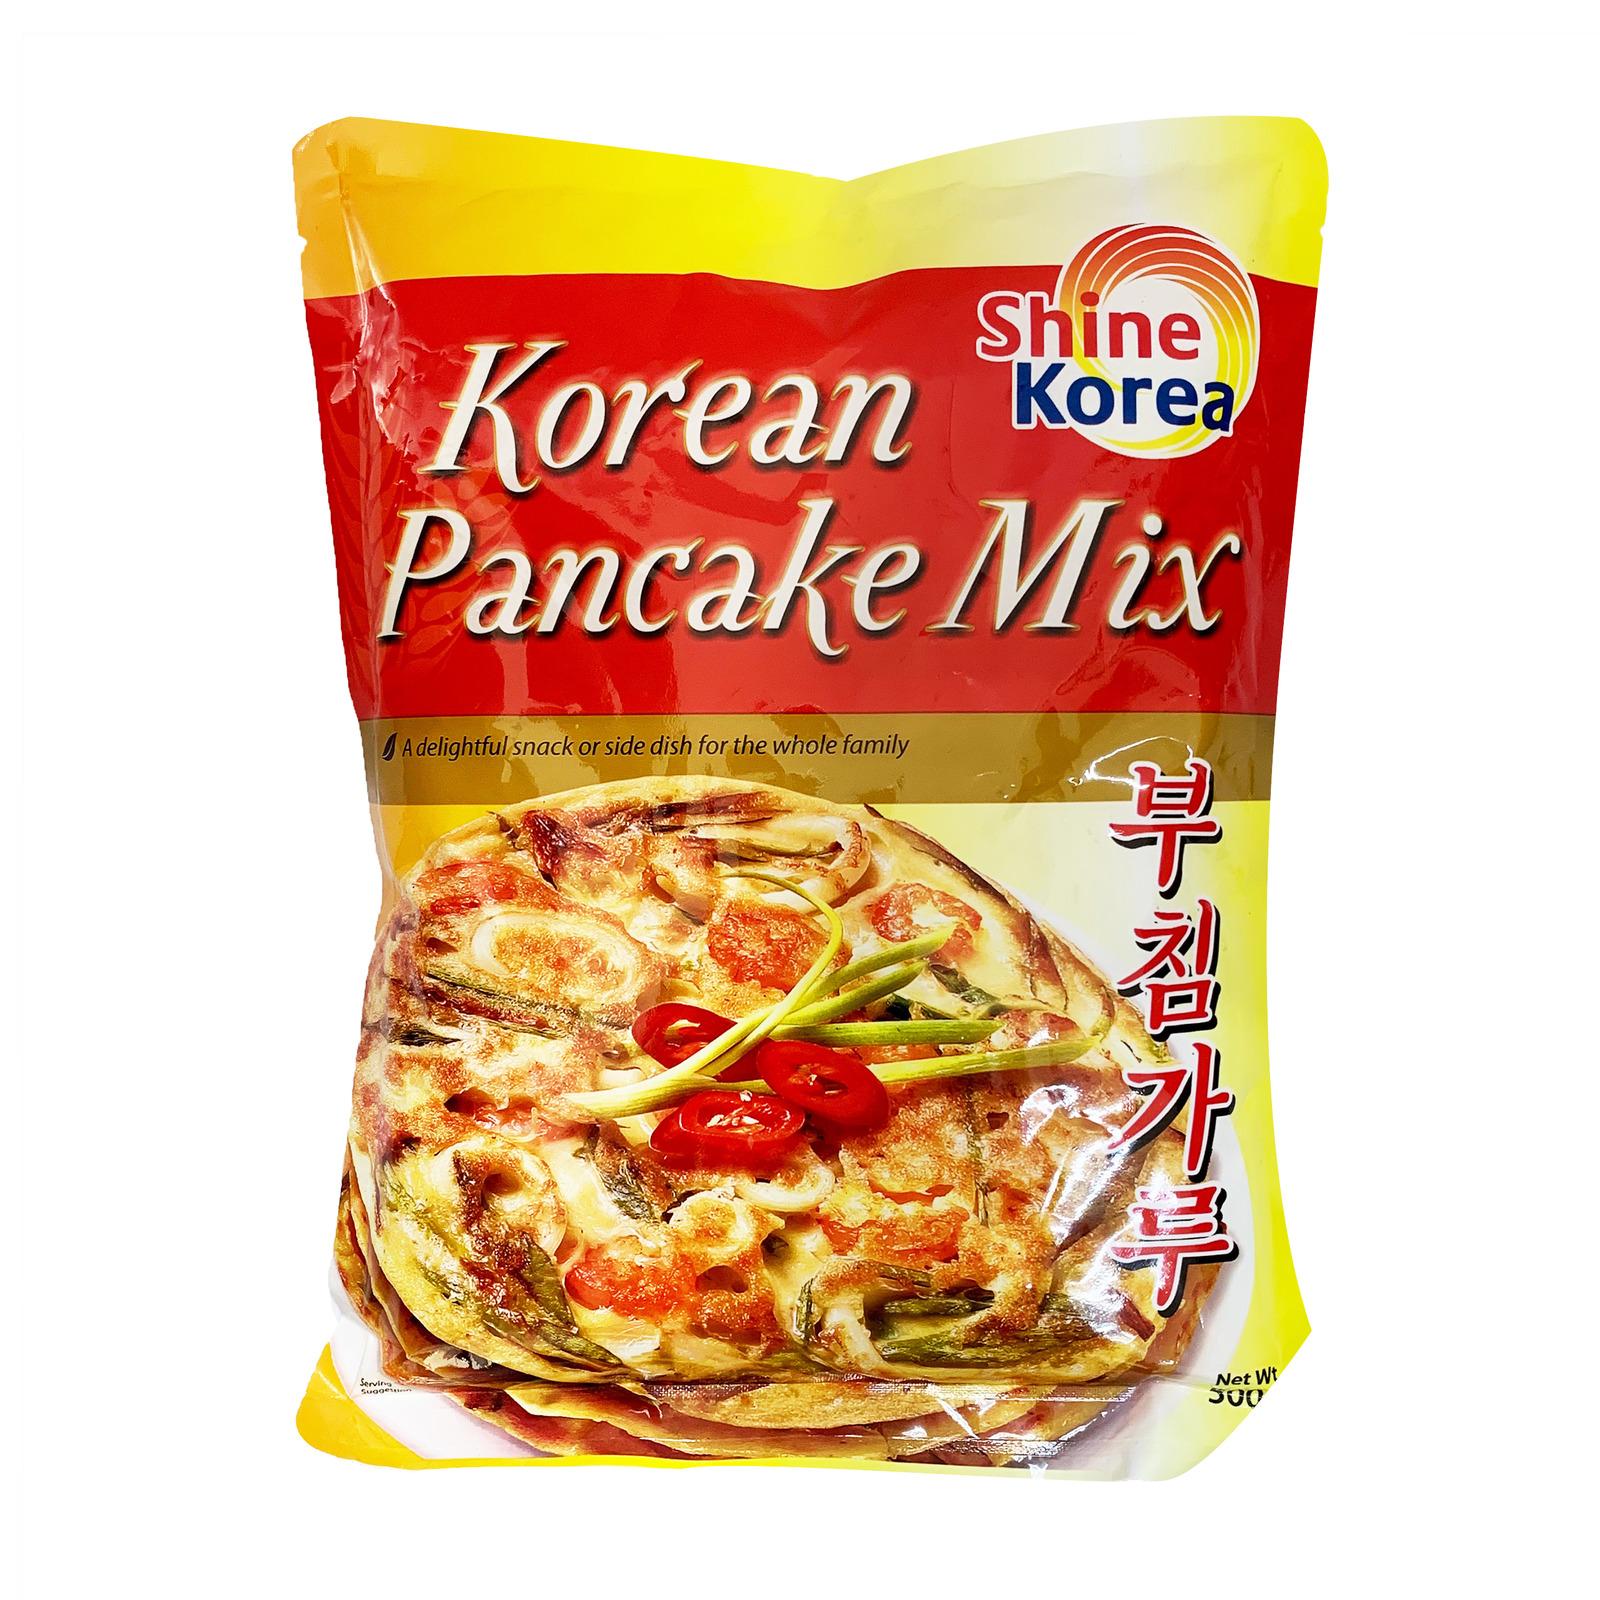 Shine Korea Pancake Mix